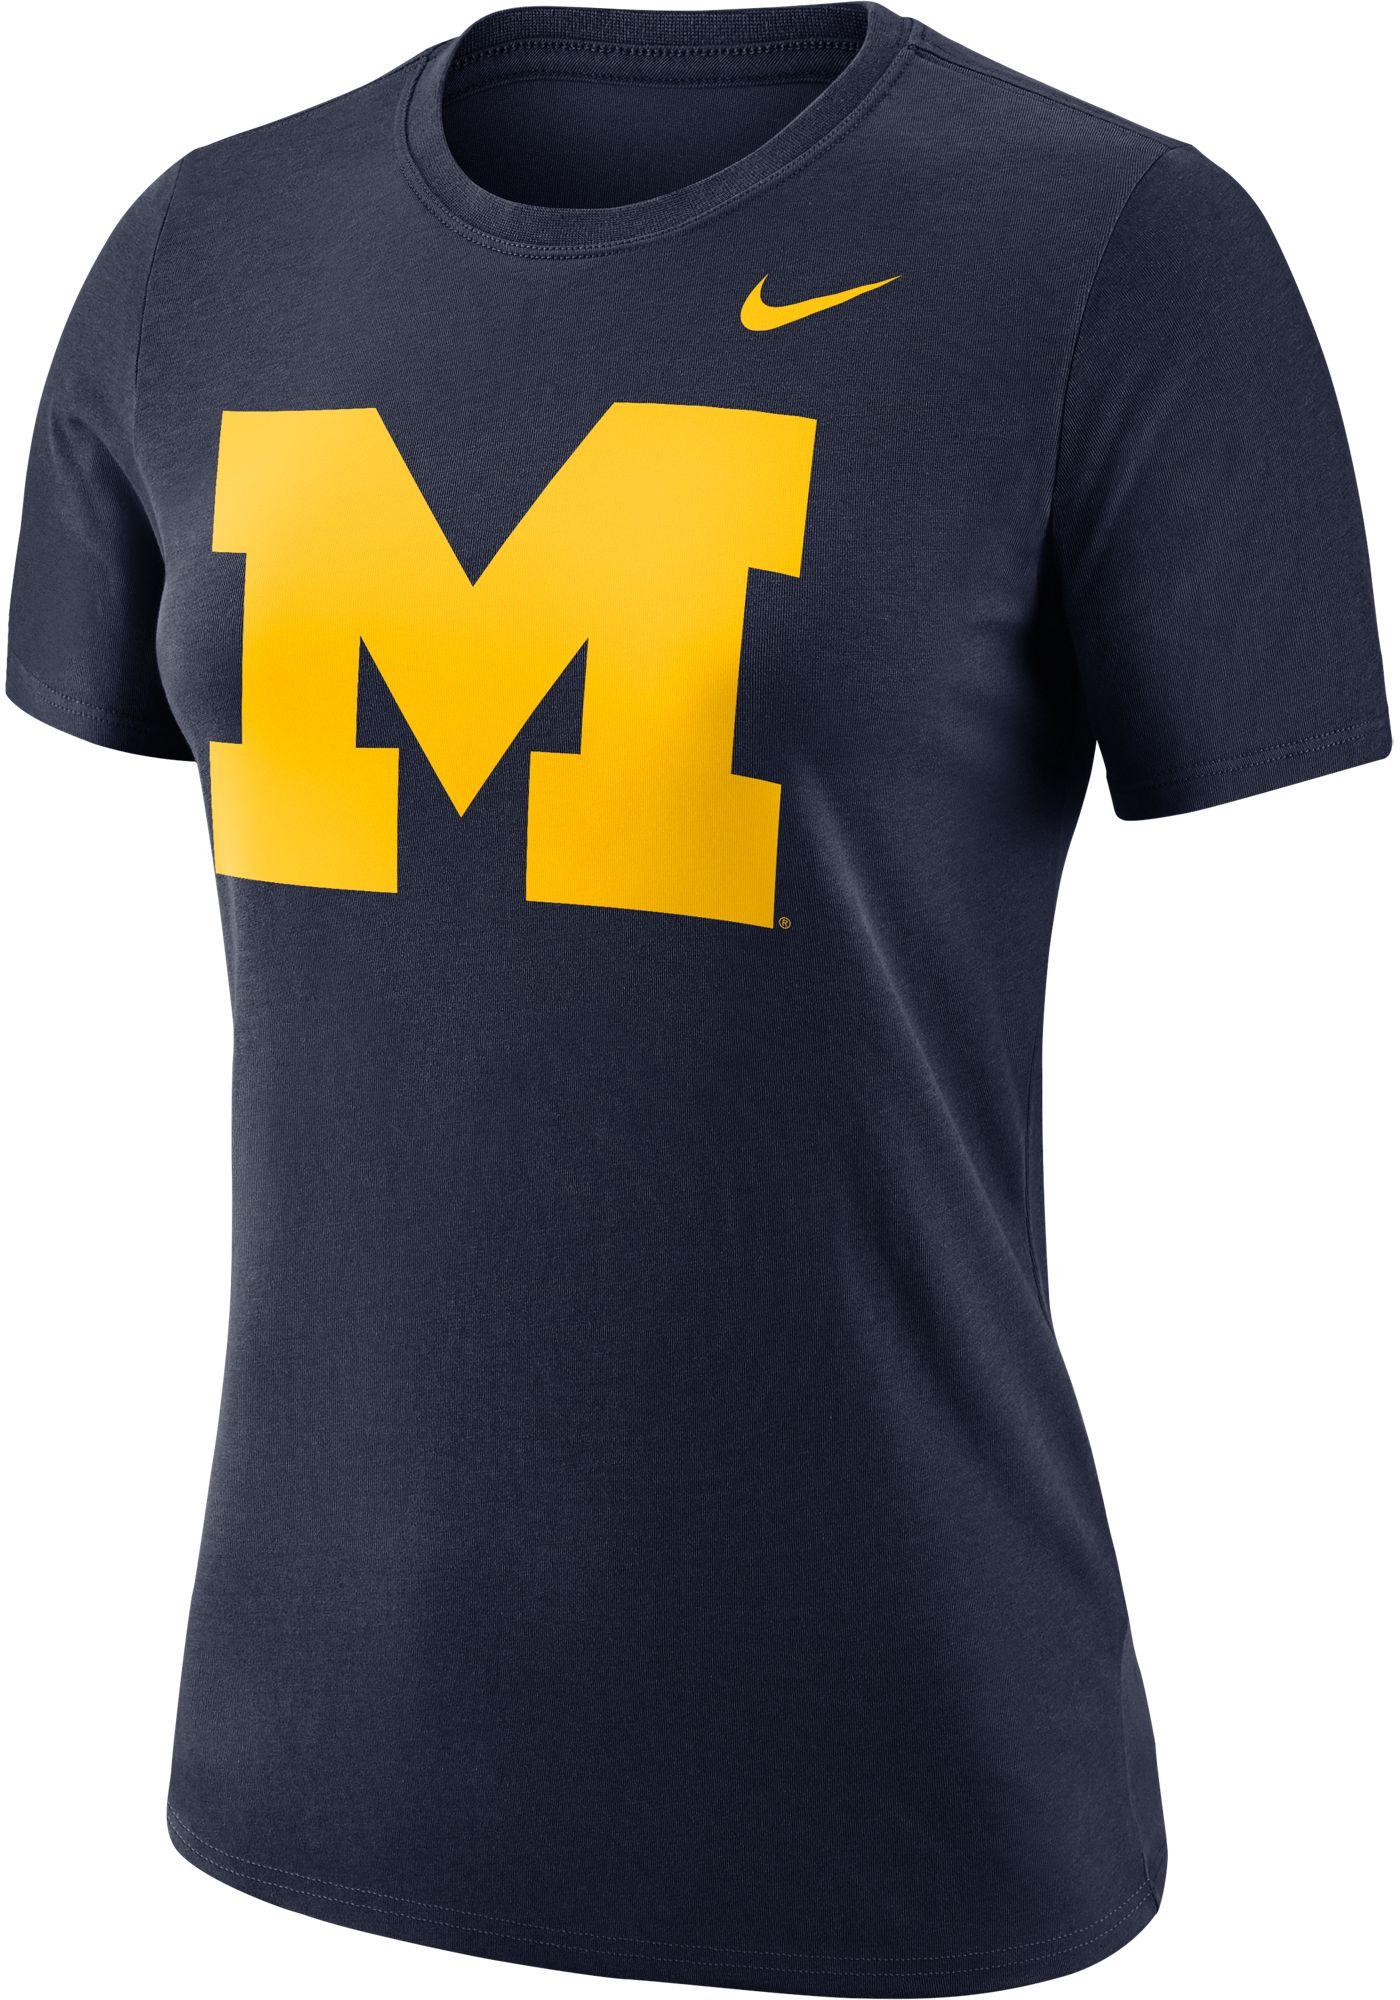 Nike Women's Michigan Wolverines Blue Dri-FIT Logo Crew T-Shirt